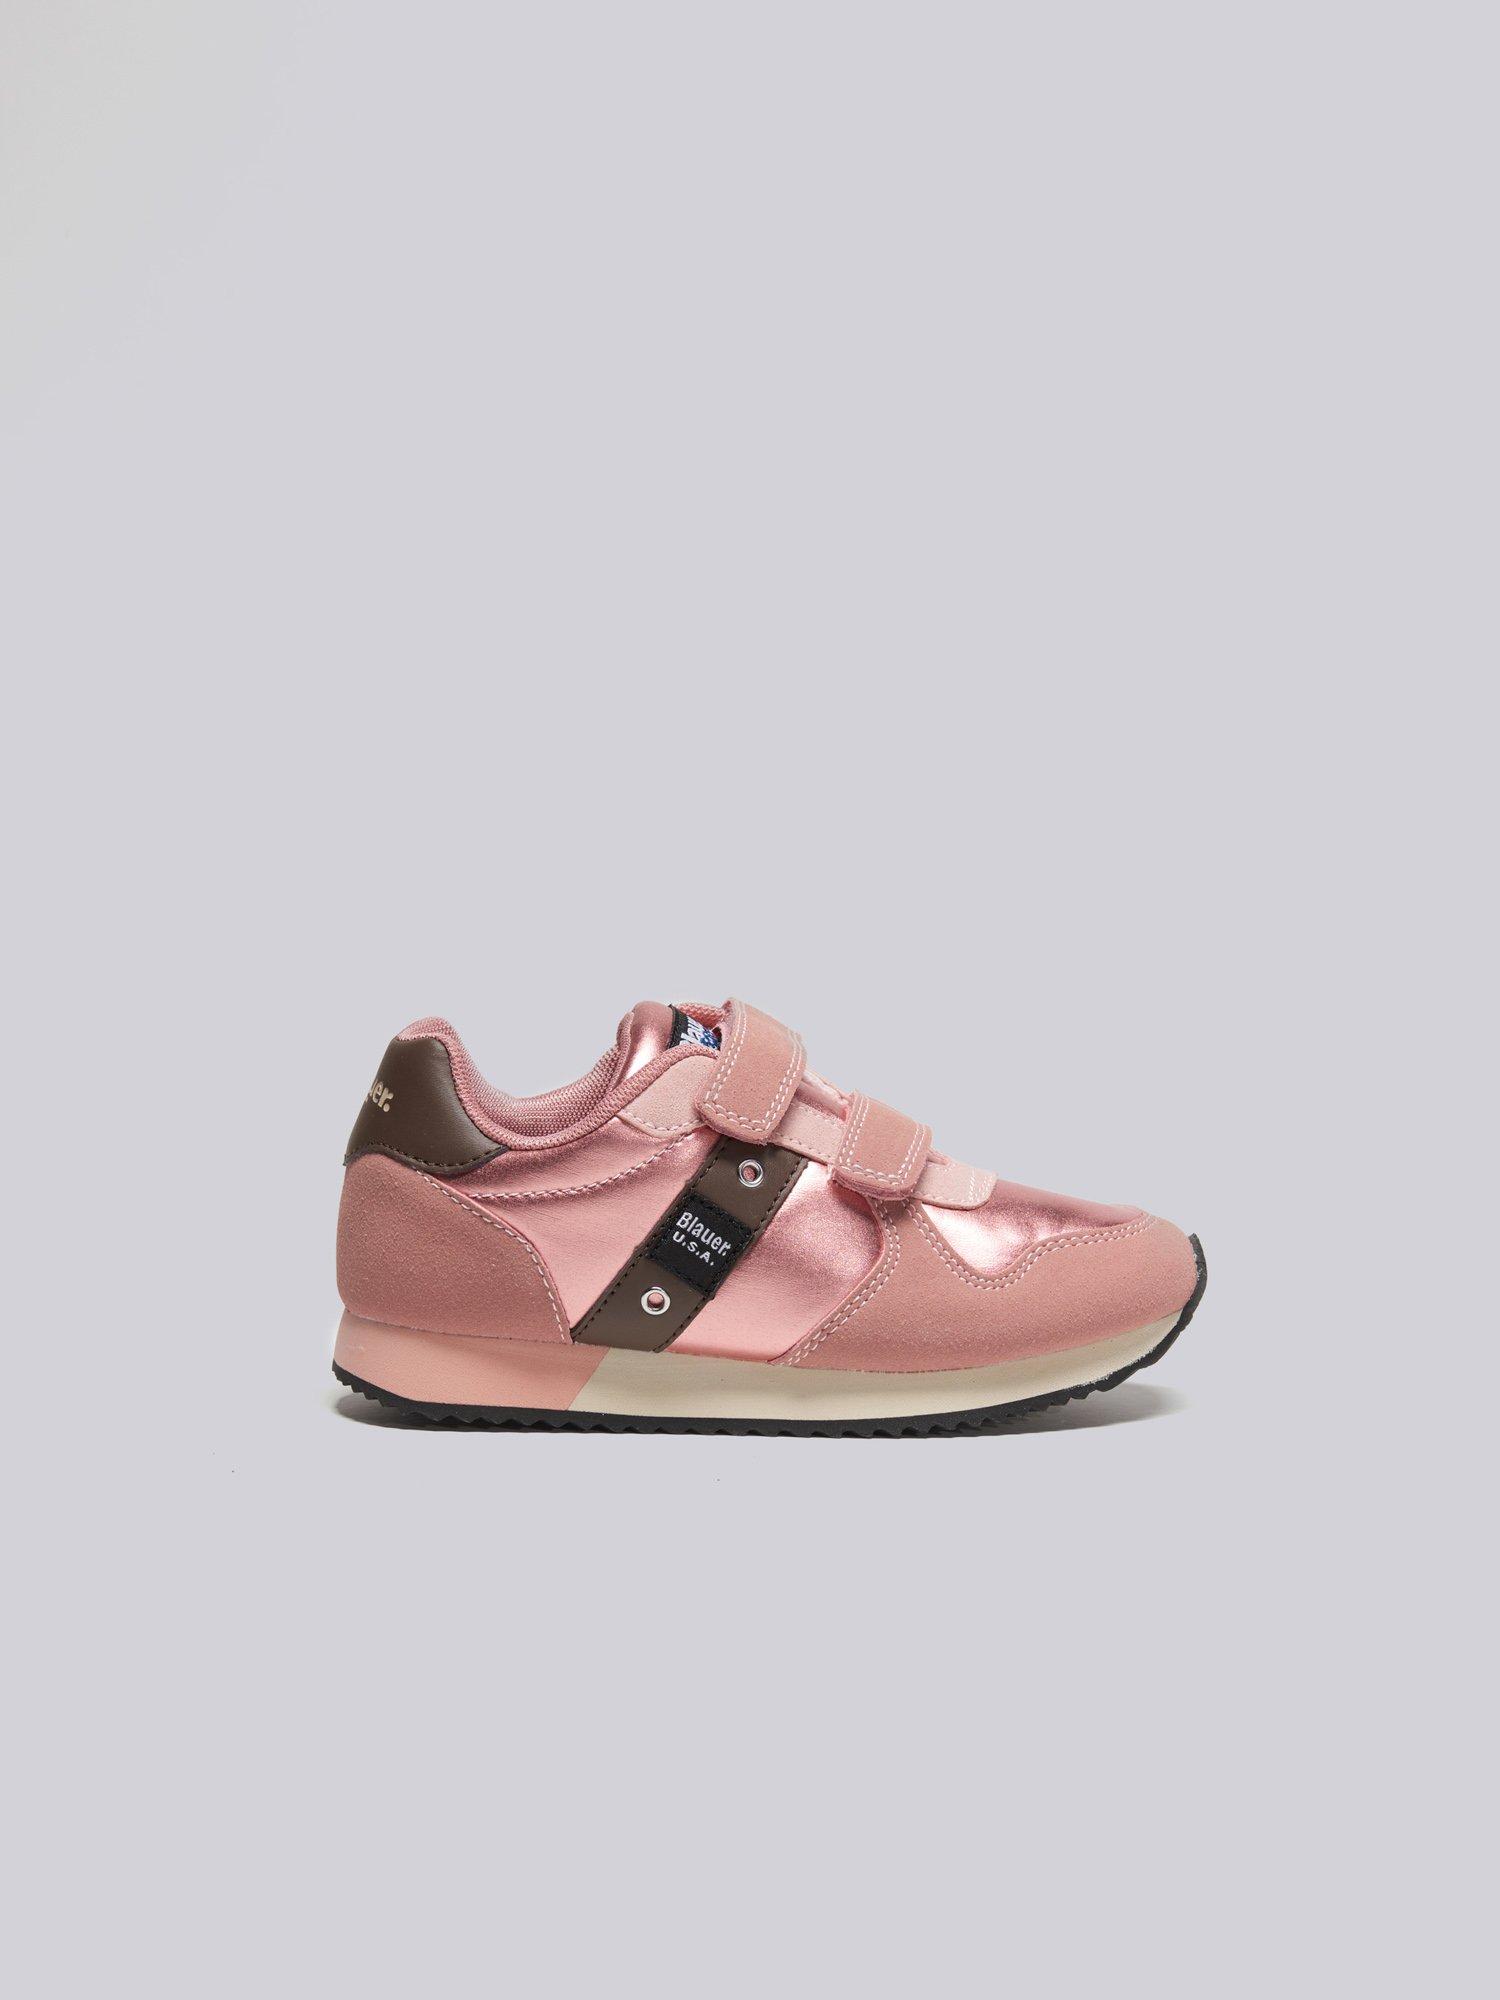 Blauer - LILLI03-NYL - Pink Quartz - Blauer